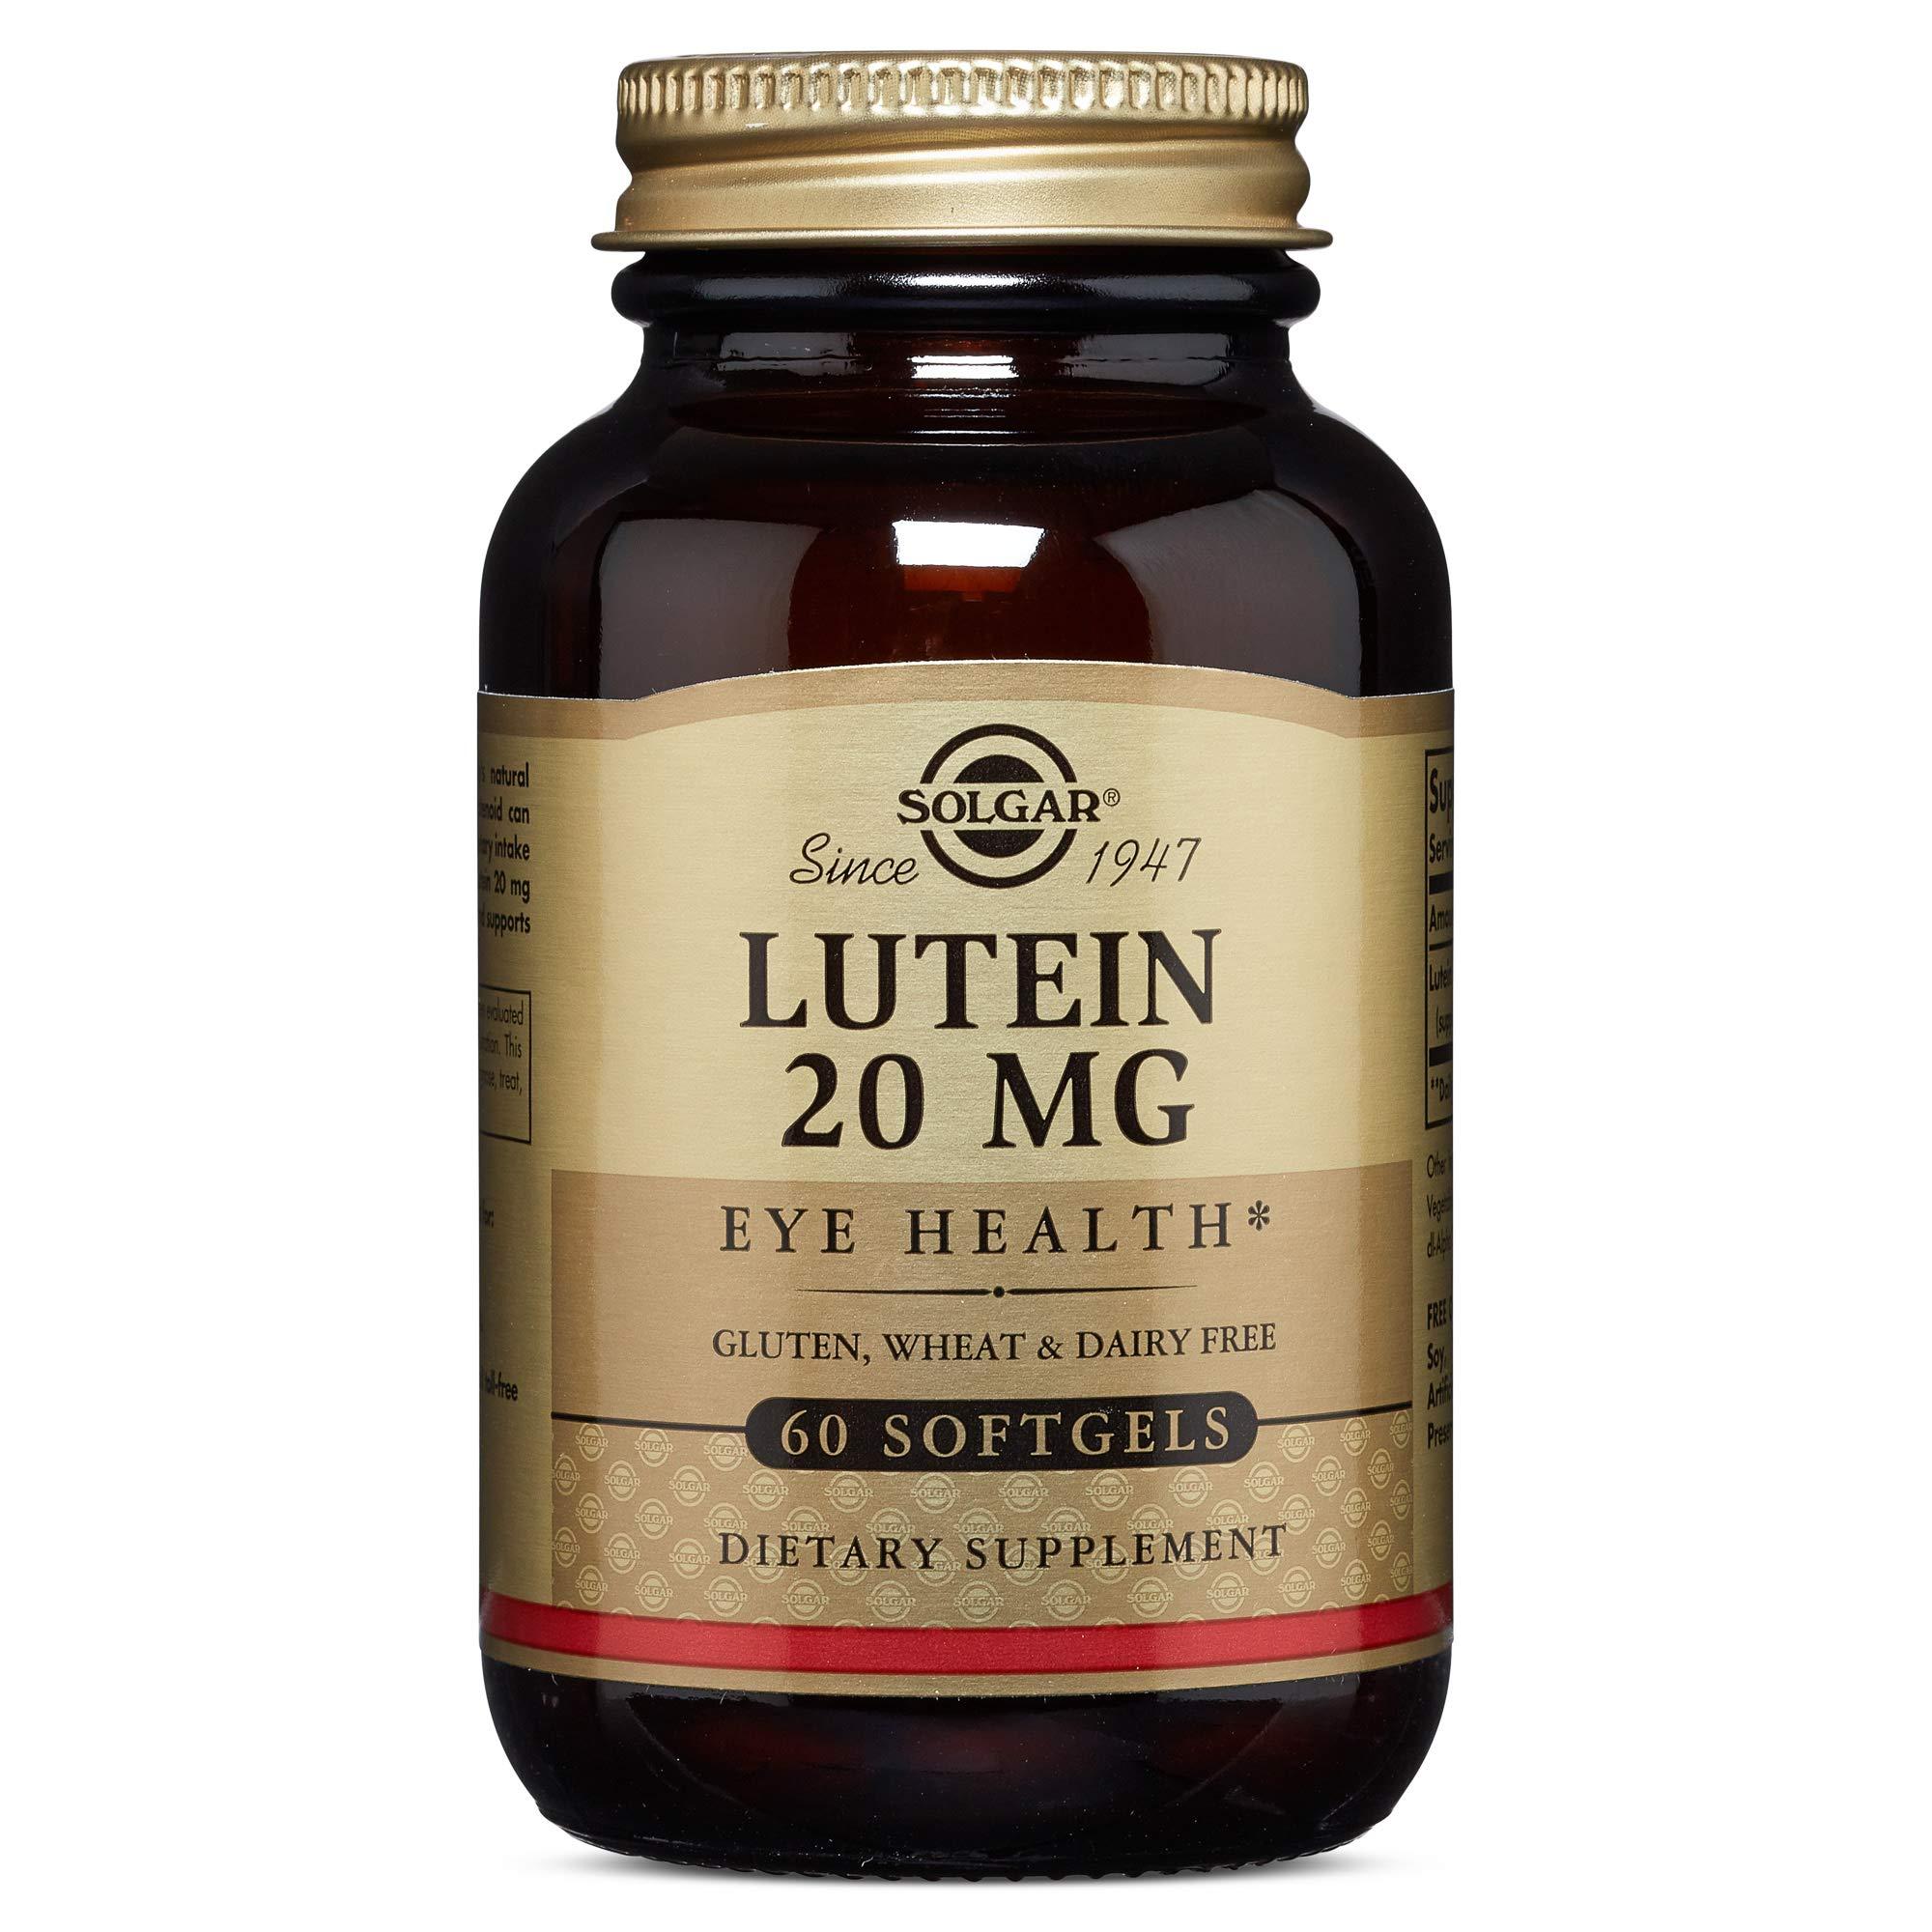 Solgar - Lutein 20 mg, 60 Softgels by Solgar